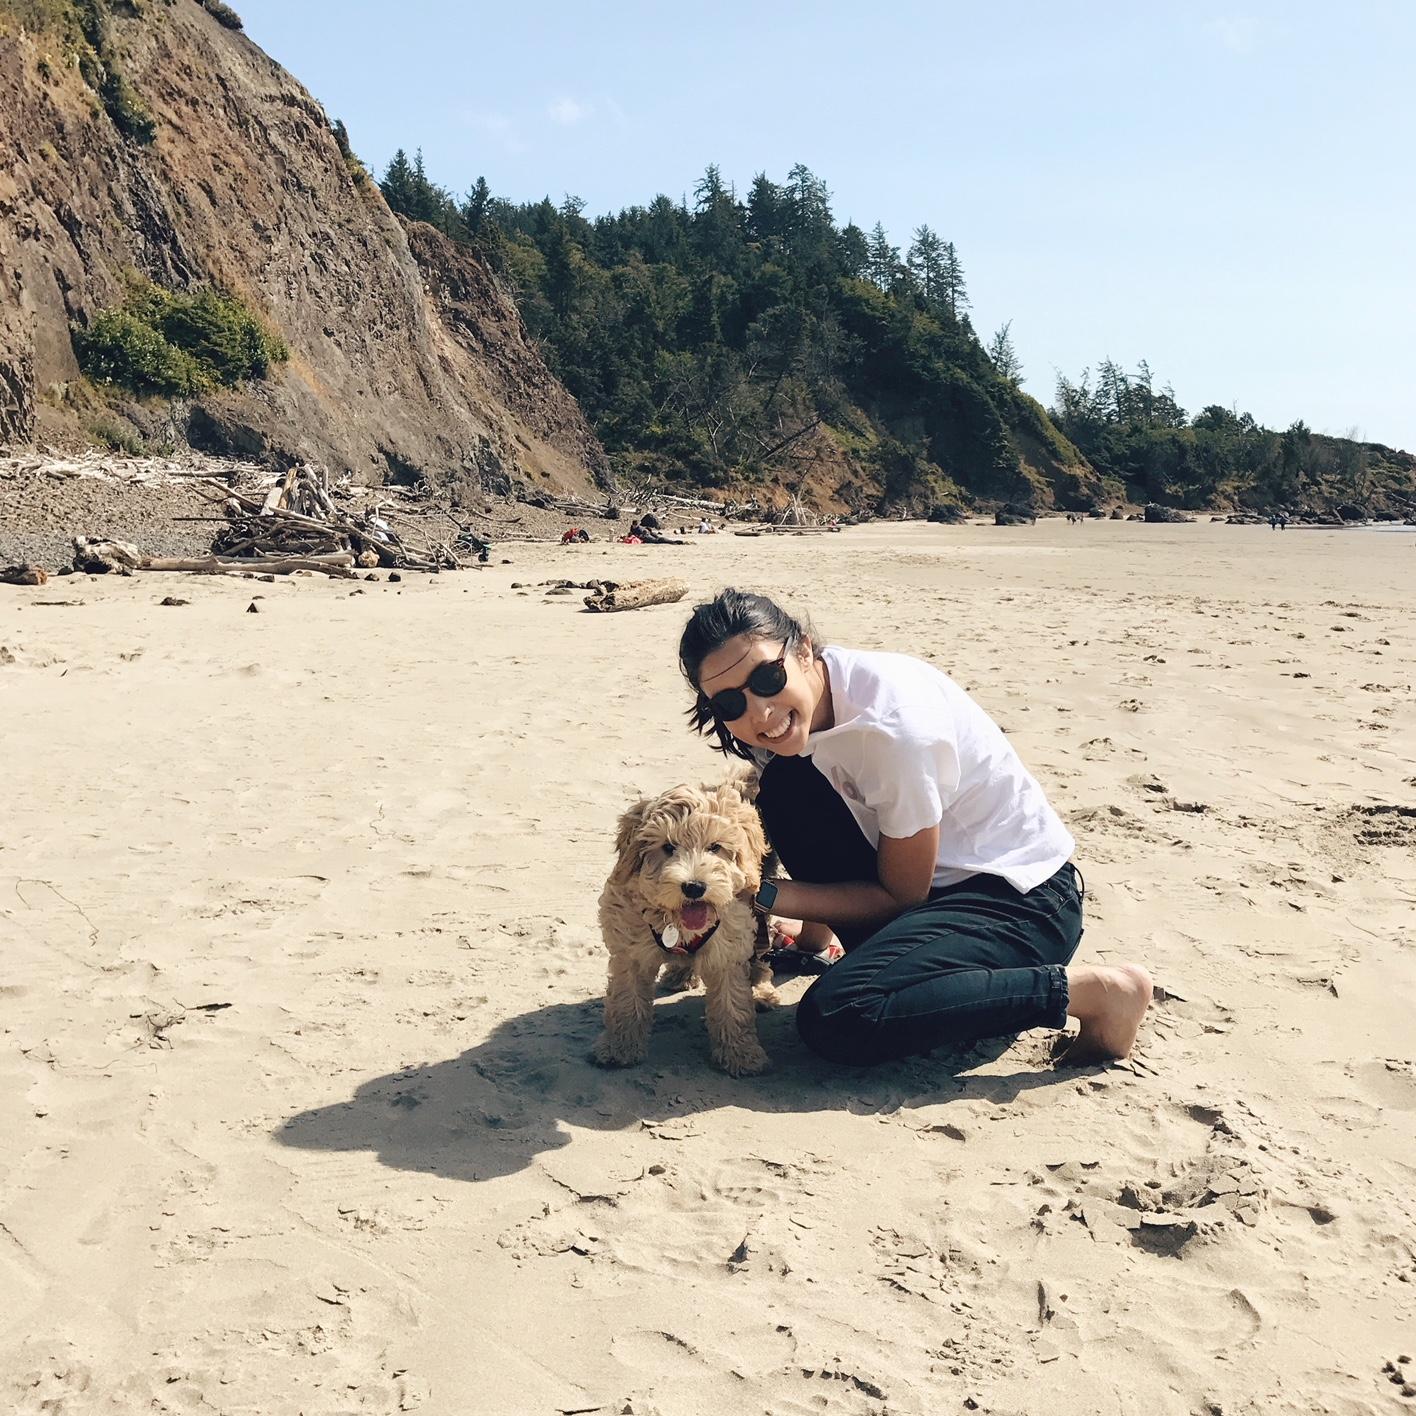 Lola at the beach